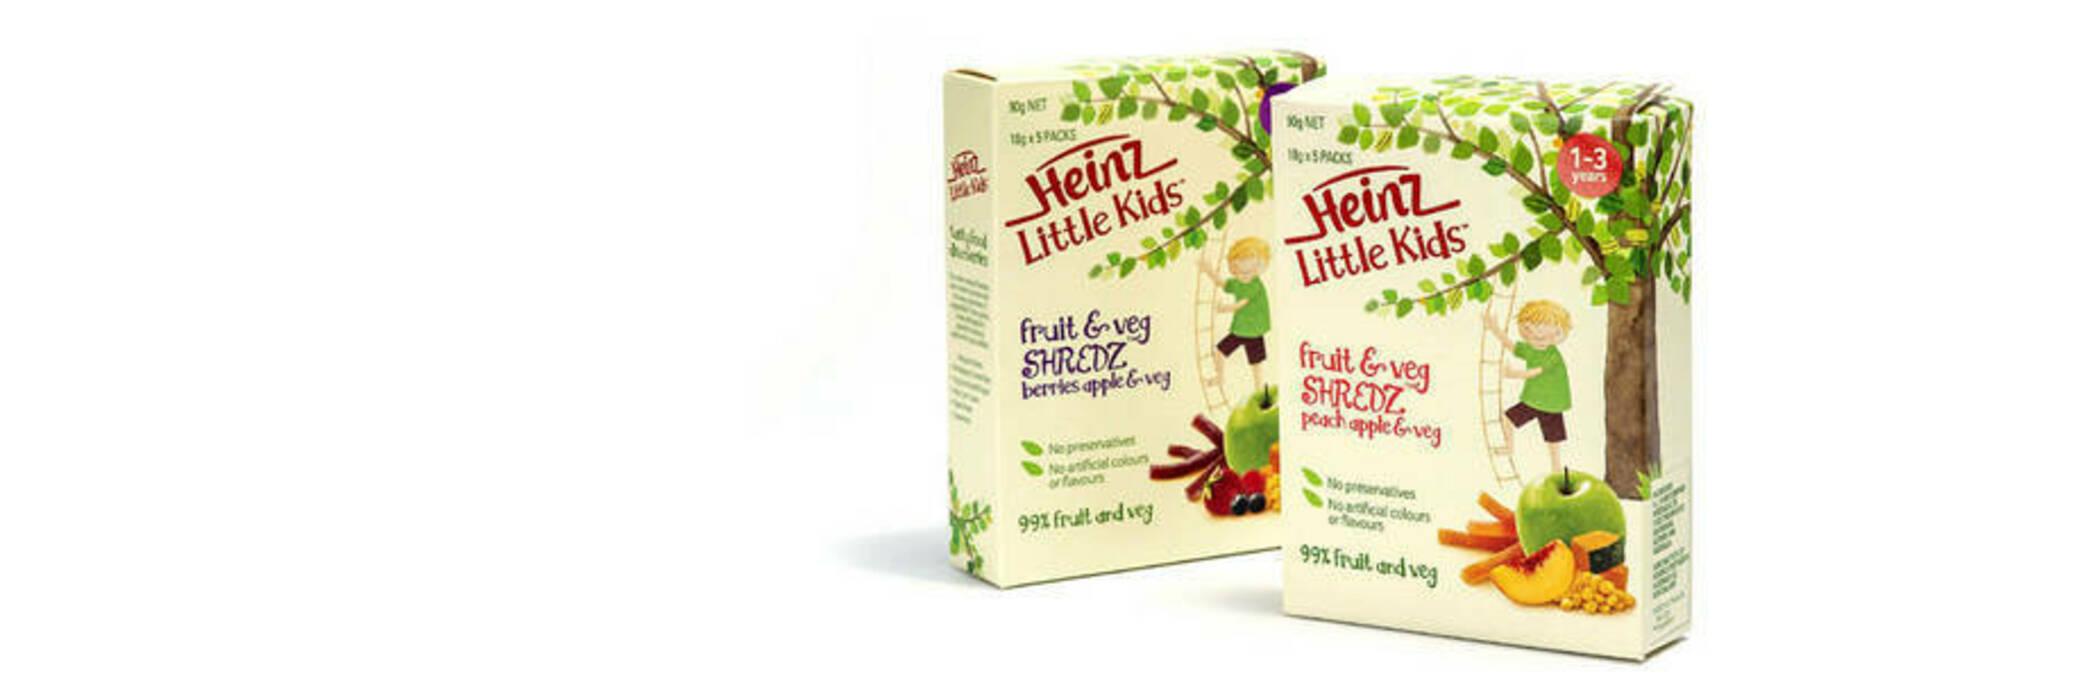 Heinz Little Kids Shredz